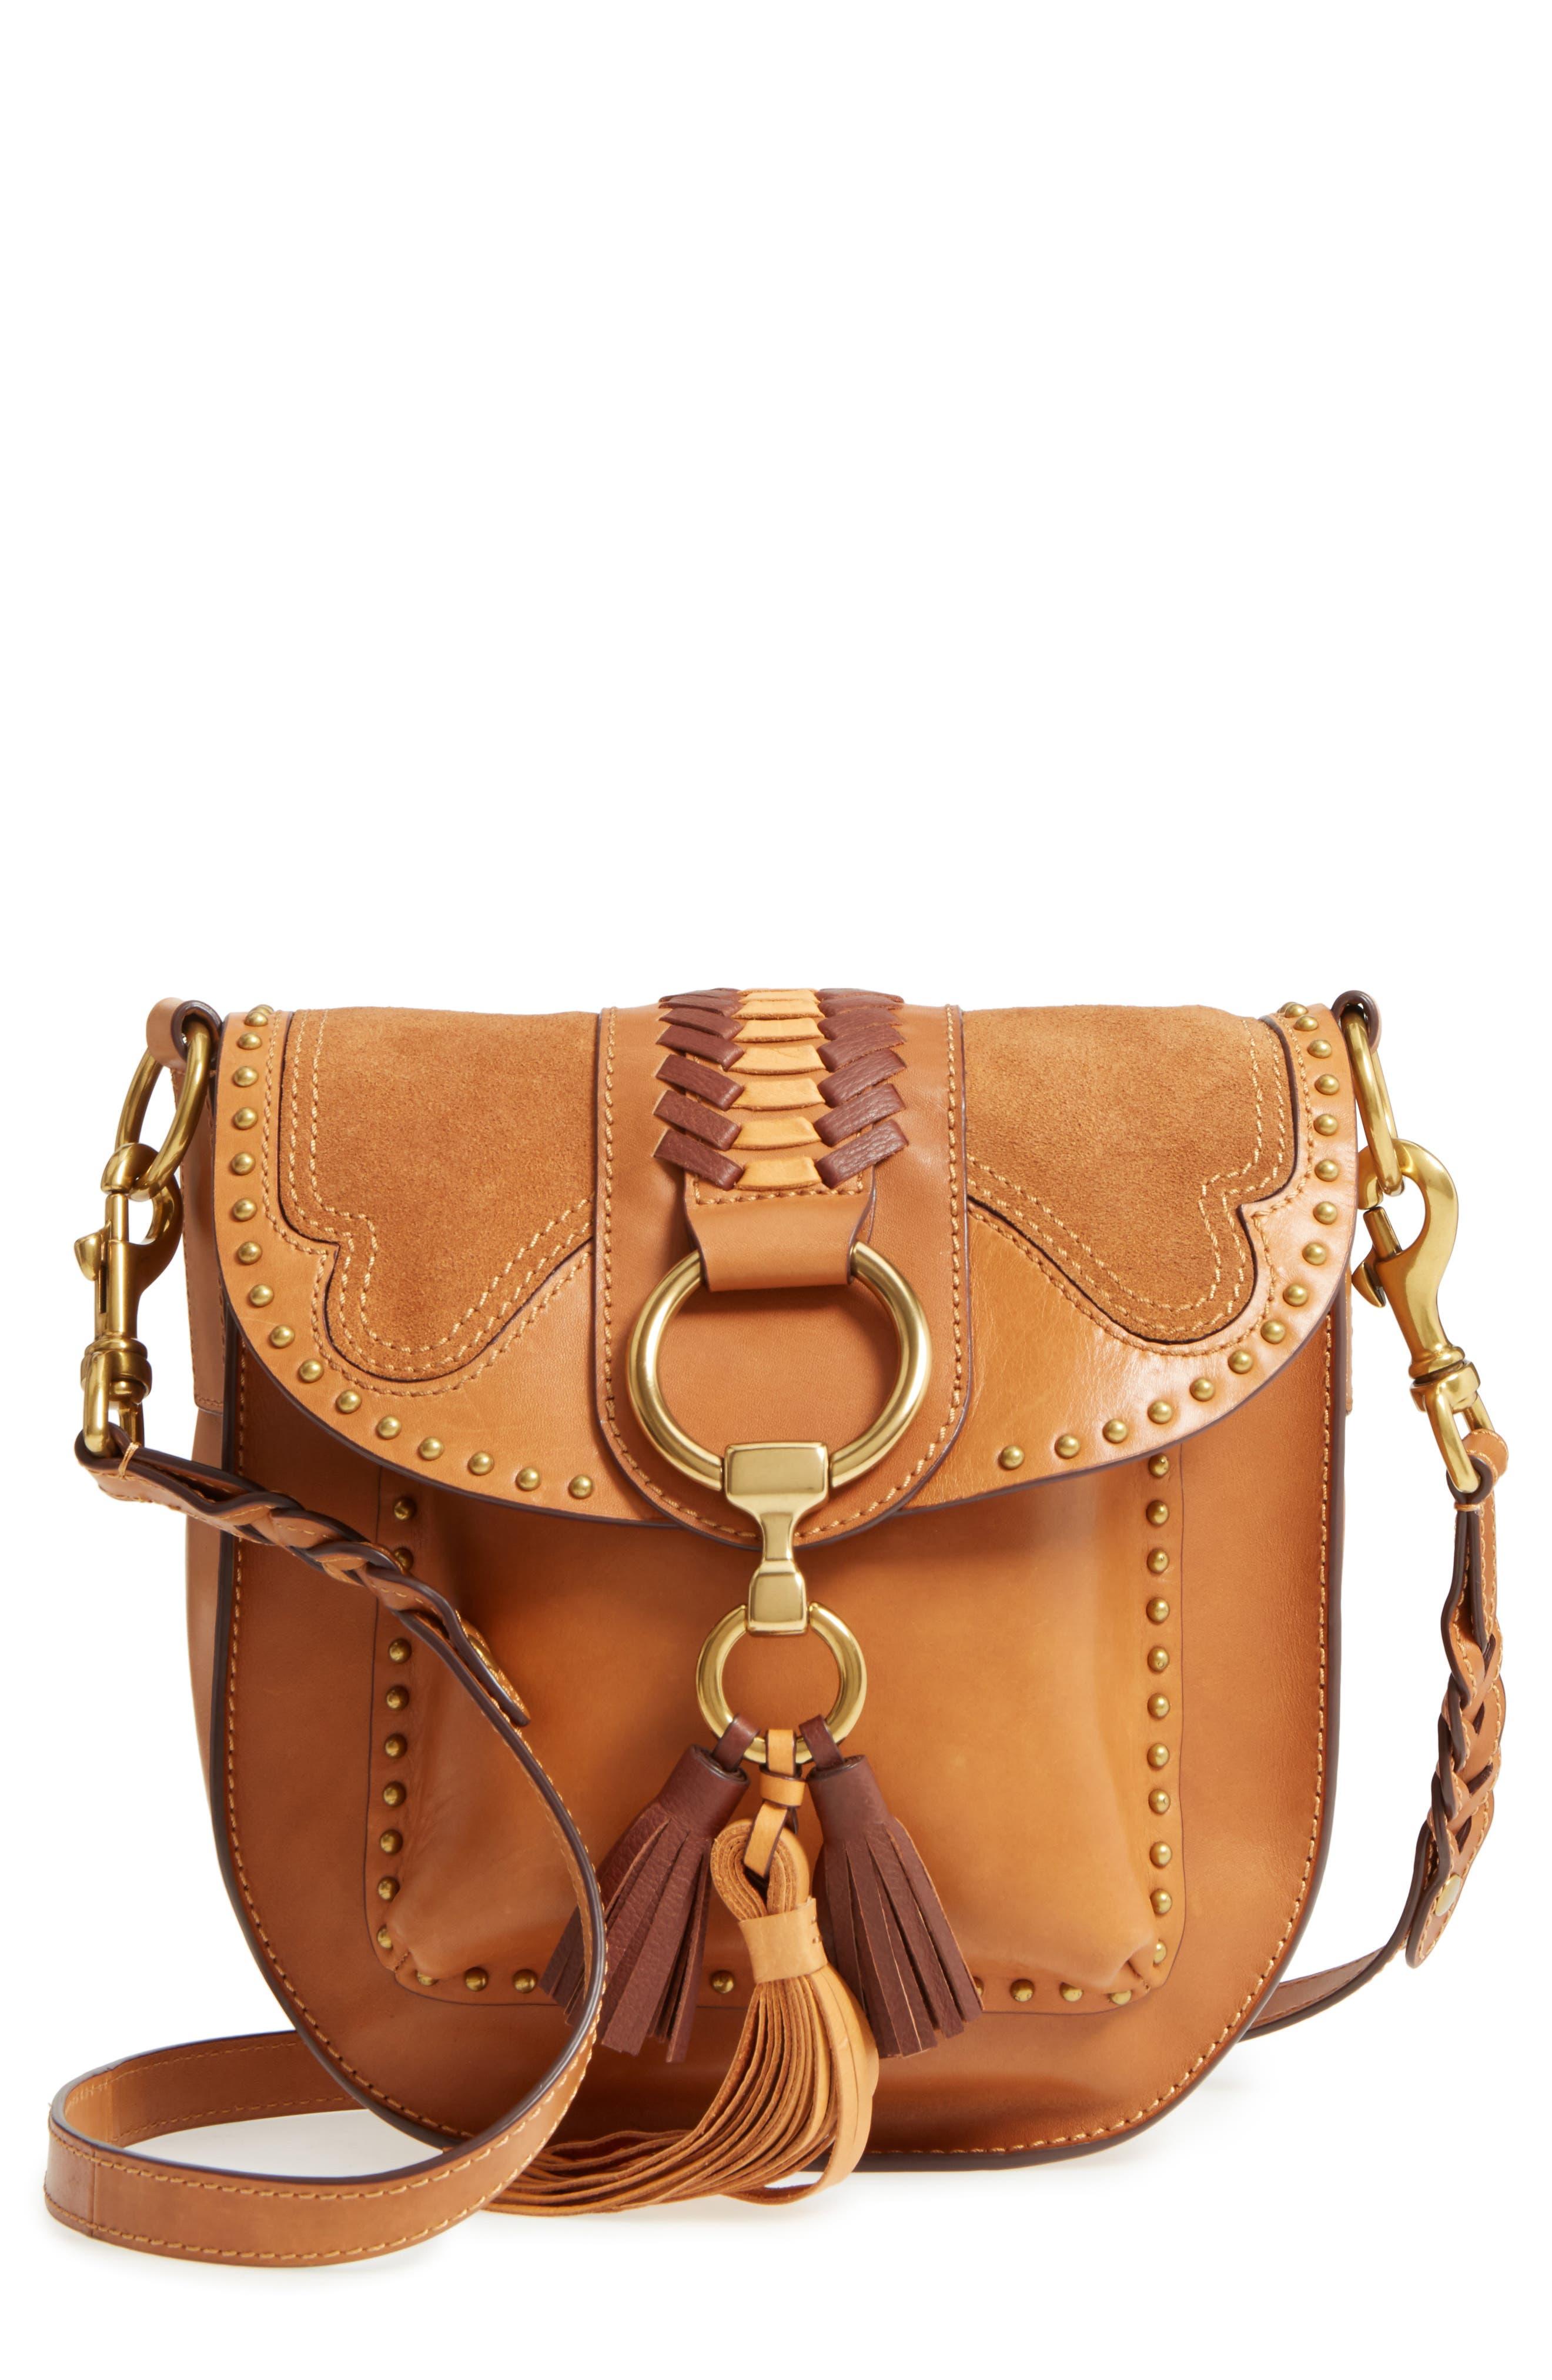 Frye Ilana Western Harness Leather Saddle Bag